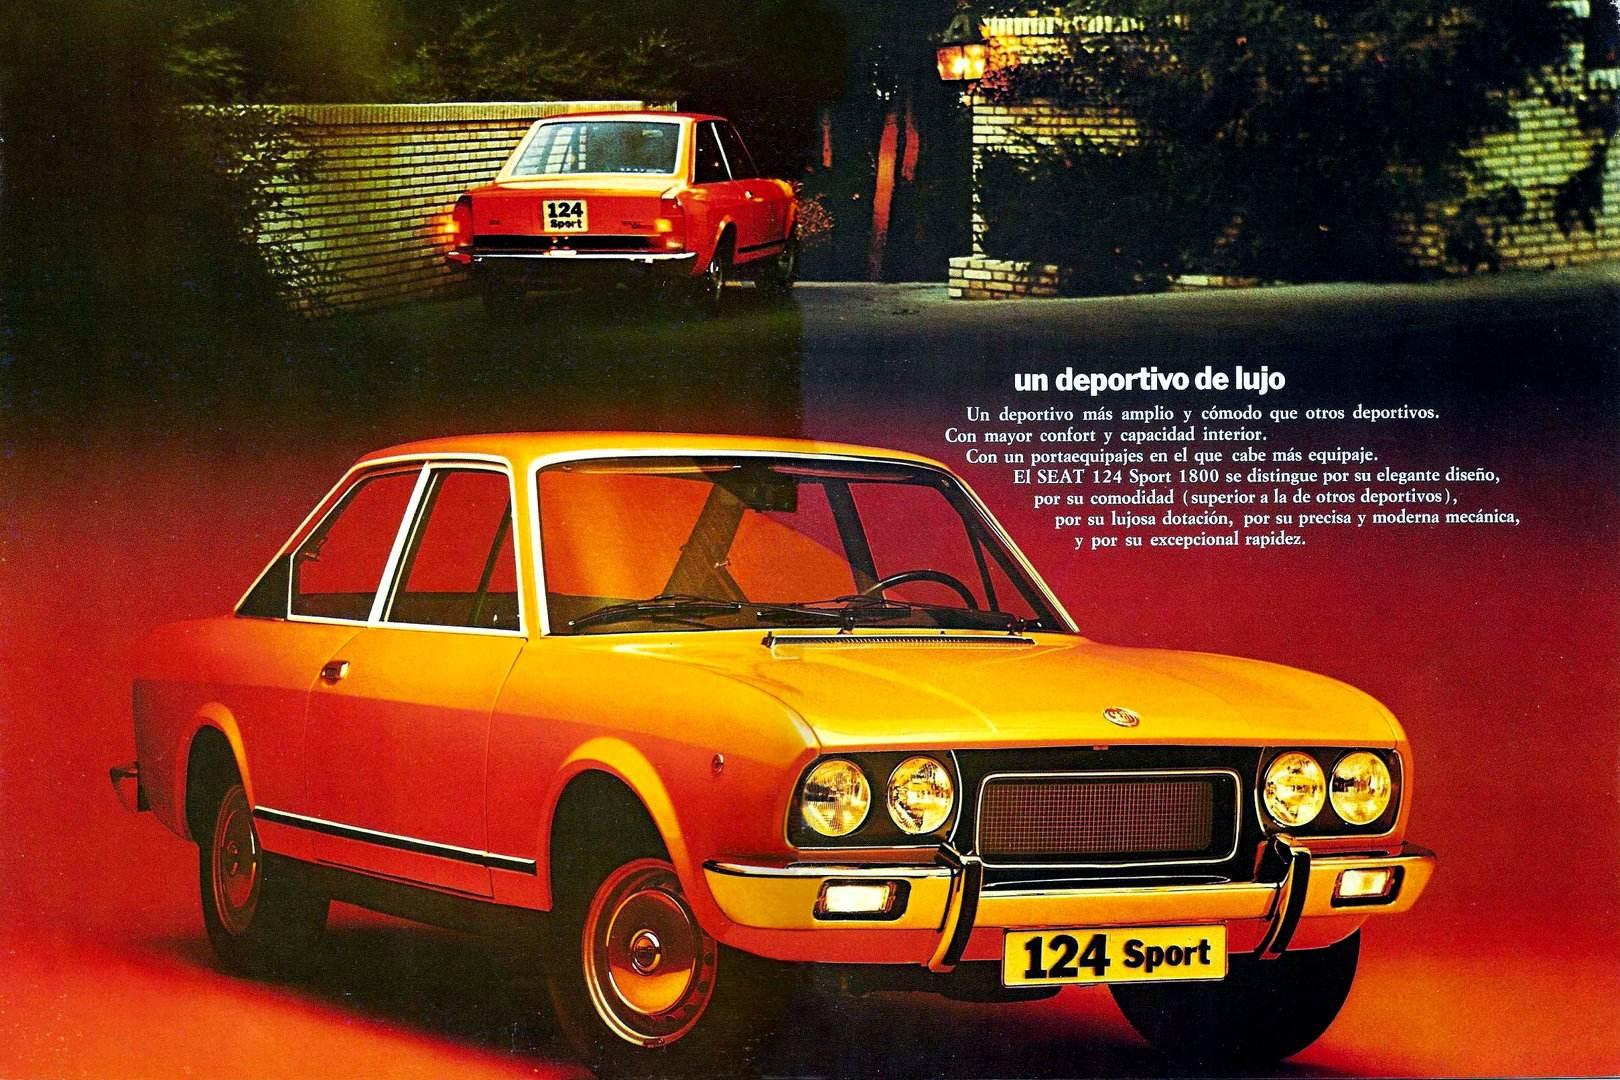 SEAT 124 Sport 1800